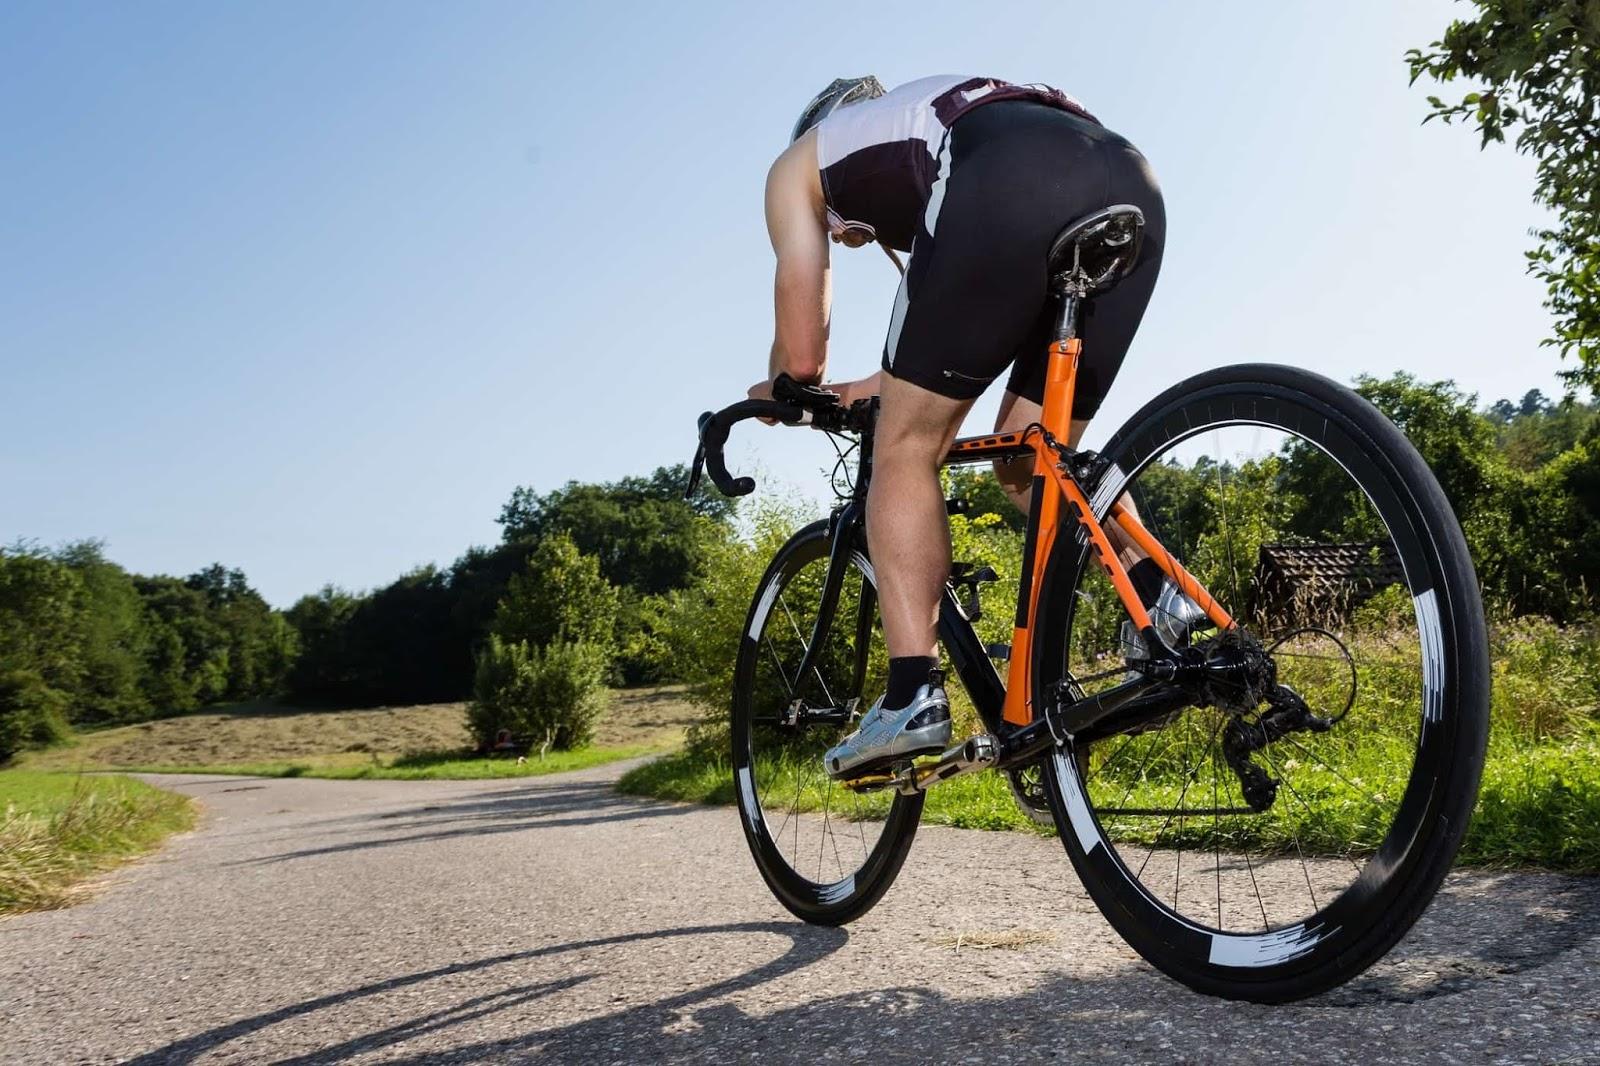 Teknik Pemindahan Gear Sepeda Trik untuk pemindahan gear sepeda di track Off-Road sbb :